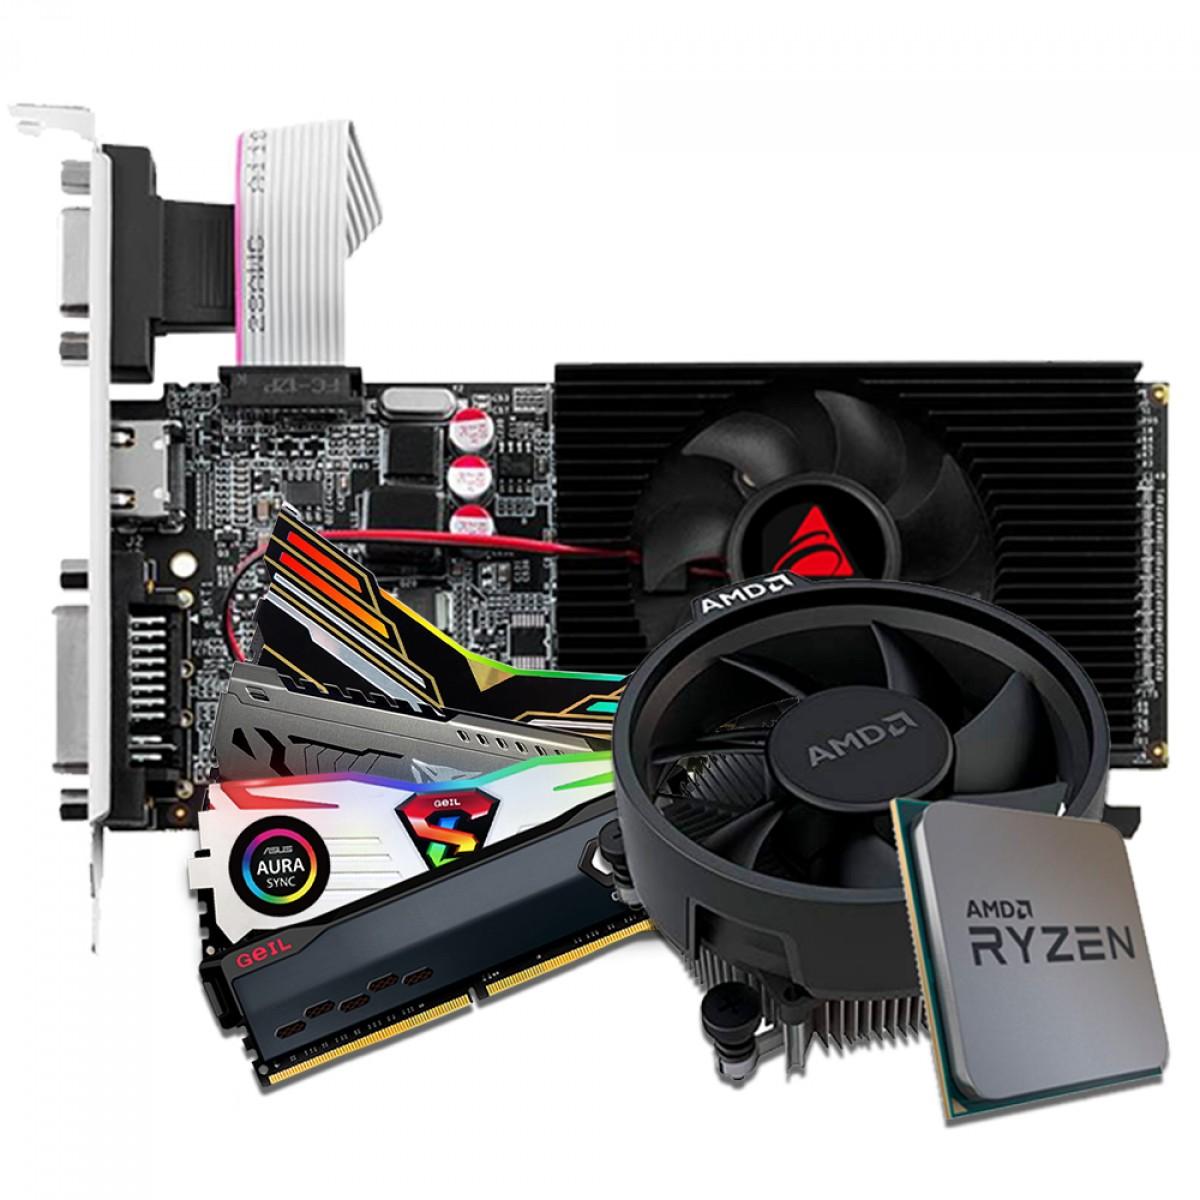 Kit Upgrade Biostar GeForce GT 610 + AMD Ryzen 5 3500 + Memória DDR4 16GB (2x8GB) 3000Mhz